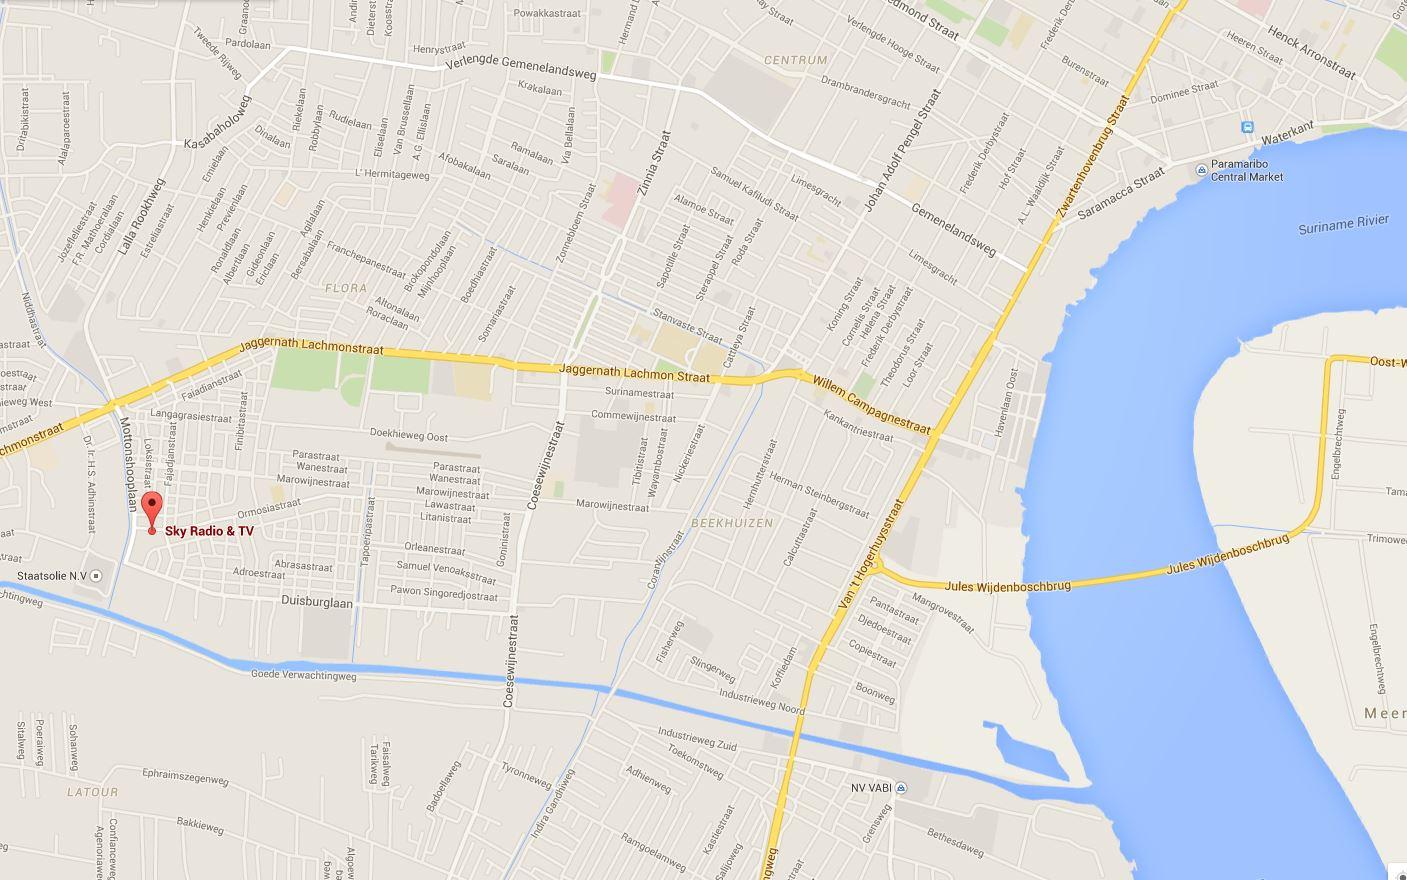 Kaart van Paramaribo